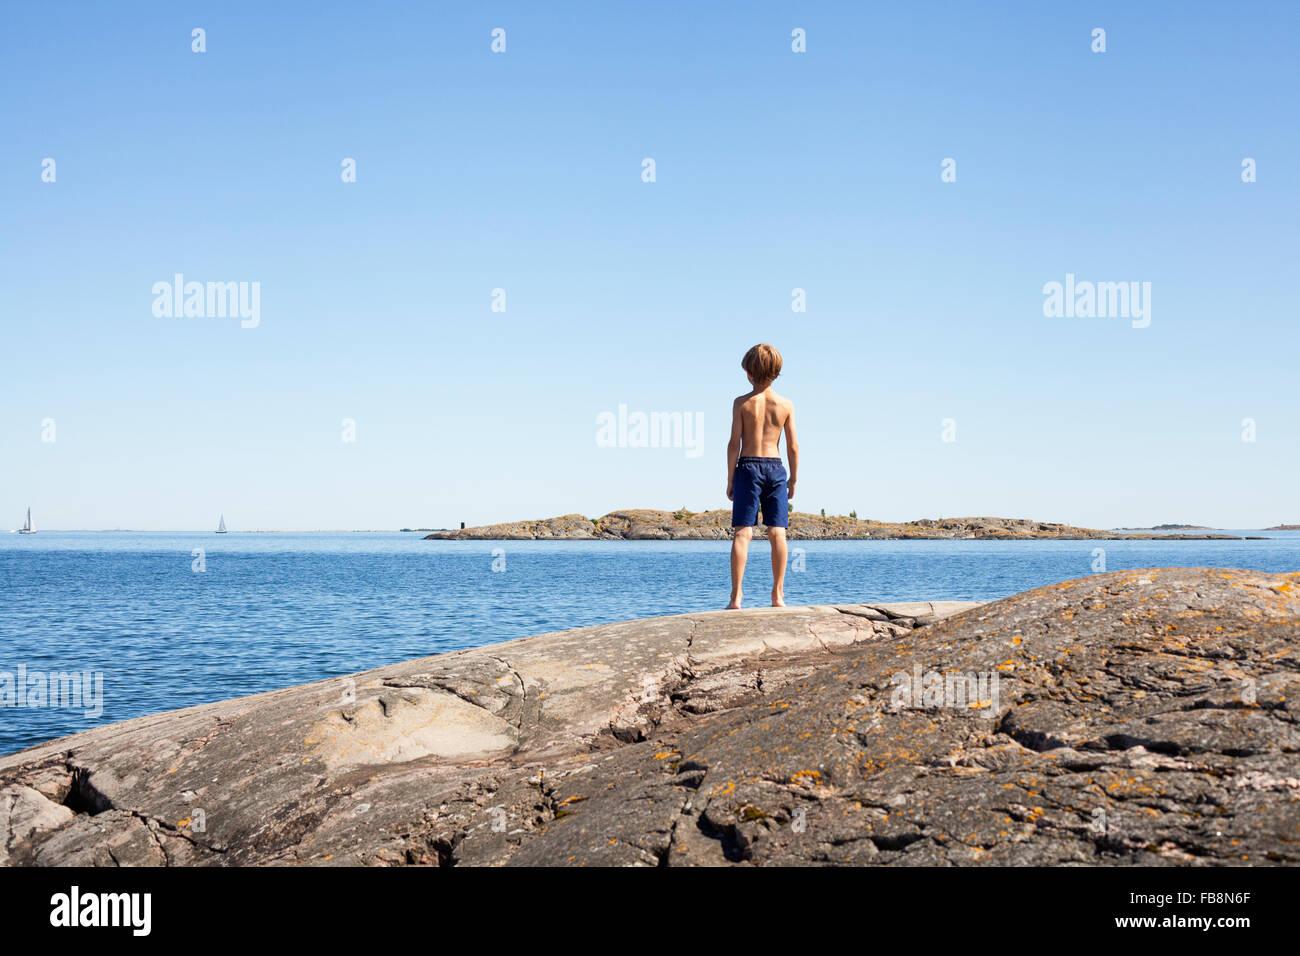 Sweden, Uppland, Runmaro, Barrskar, Rear view of boy (6-7) looking at sea - Stock Image